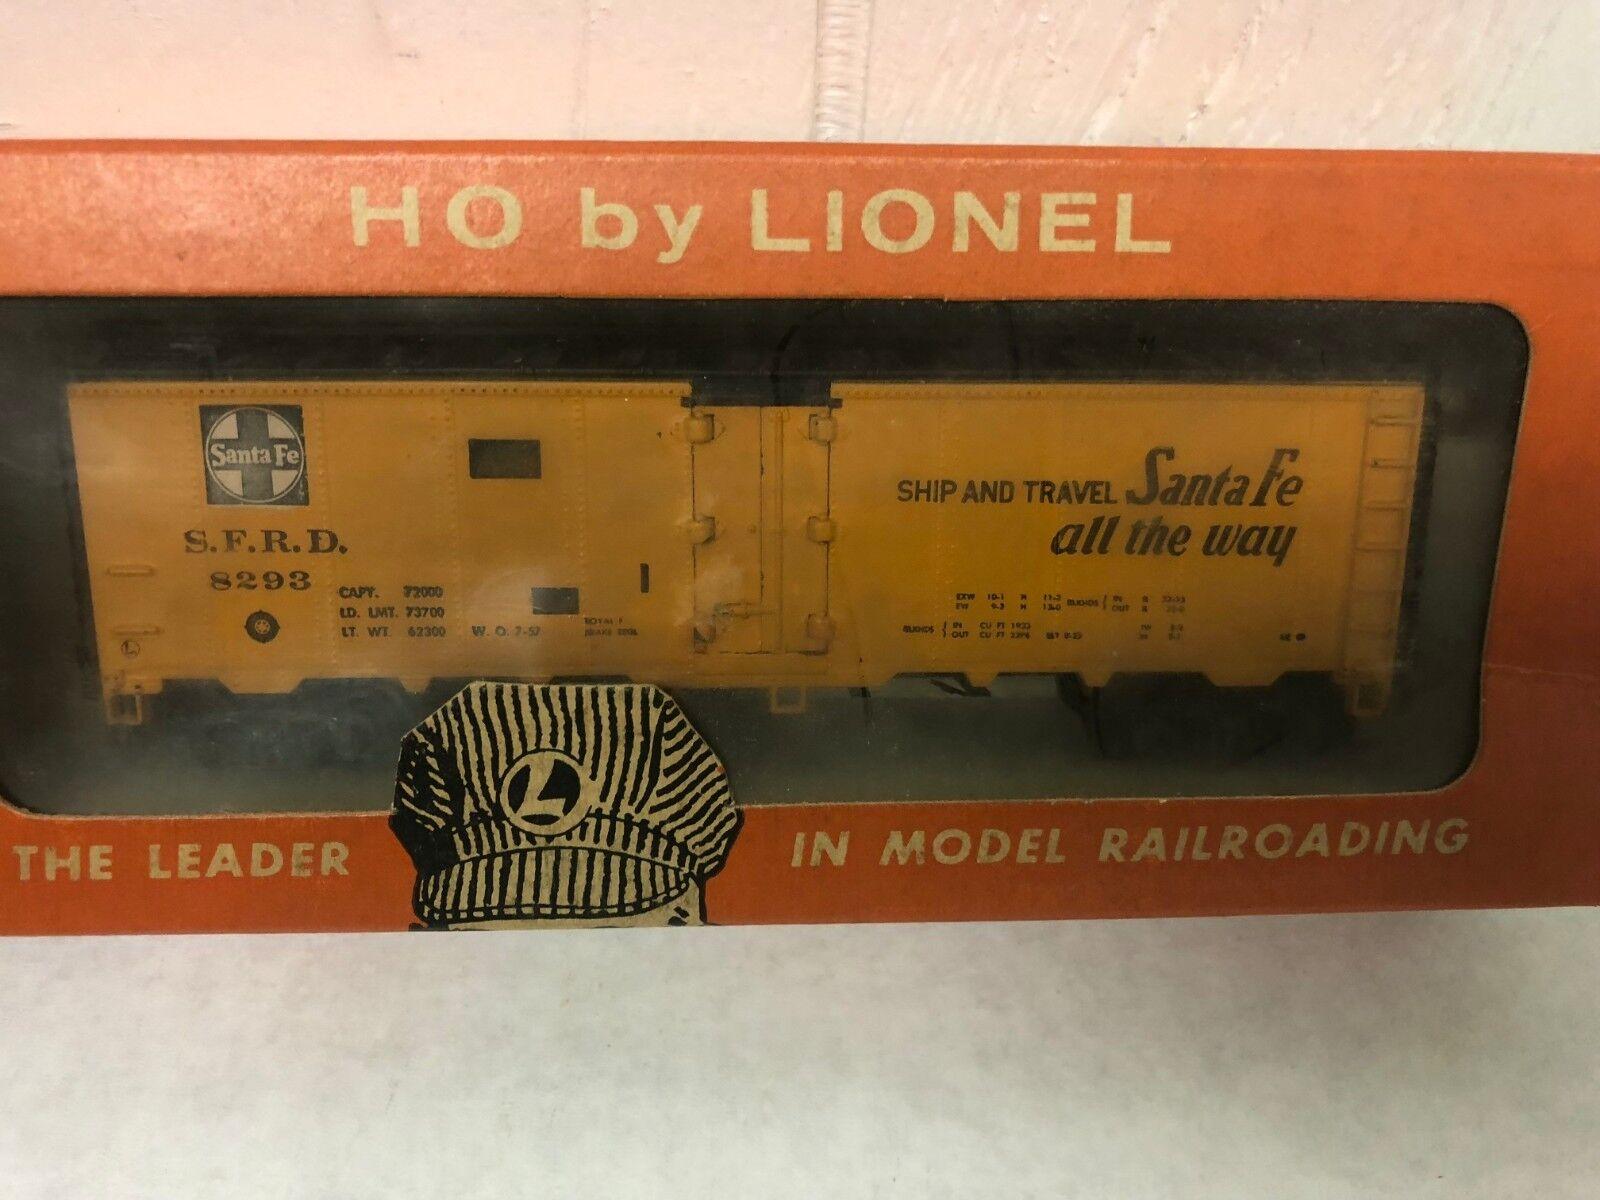 Lionel HO Scale Train Car 0872-50 Santa Fe Box Vintage Original Box